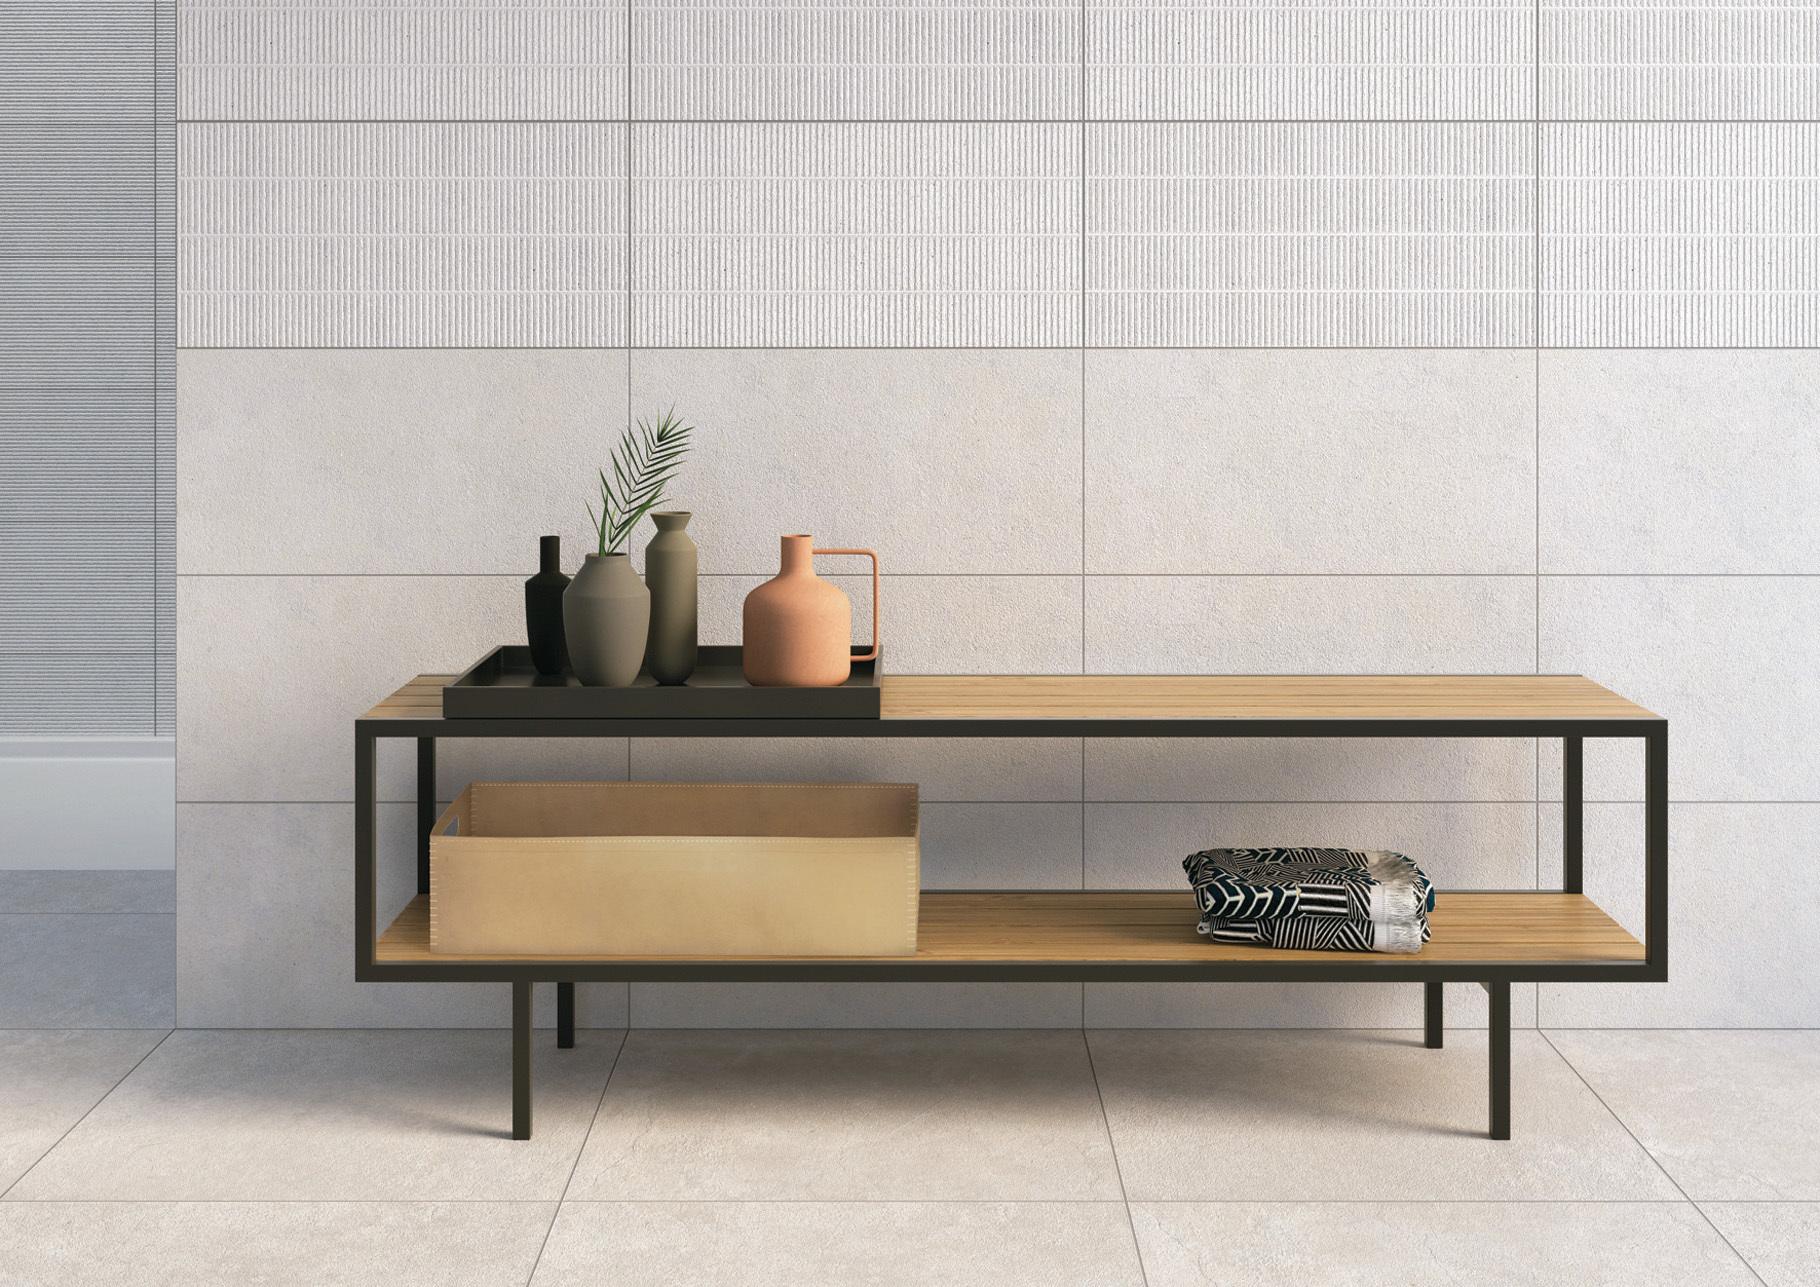 bad sideboard amazing sideboard anmutig sideboard massivholz ga nstig ideen schan neu sideboard. Black Bedroom Furniture Sets. Home Design Ideas